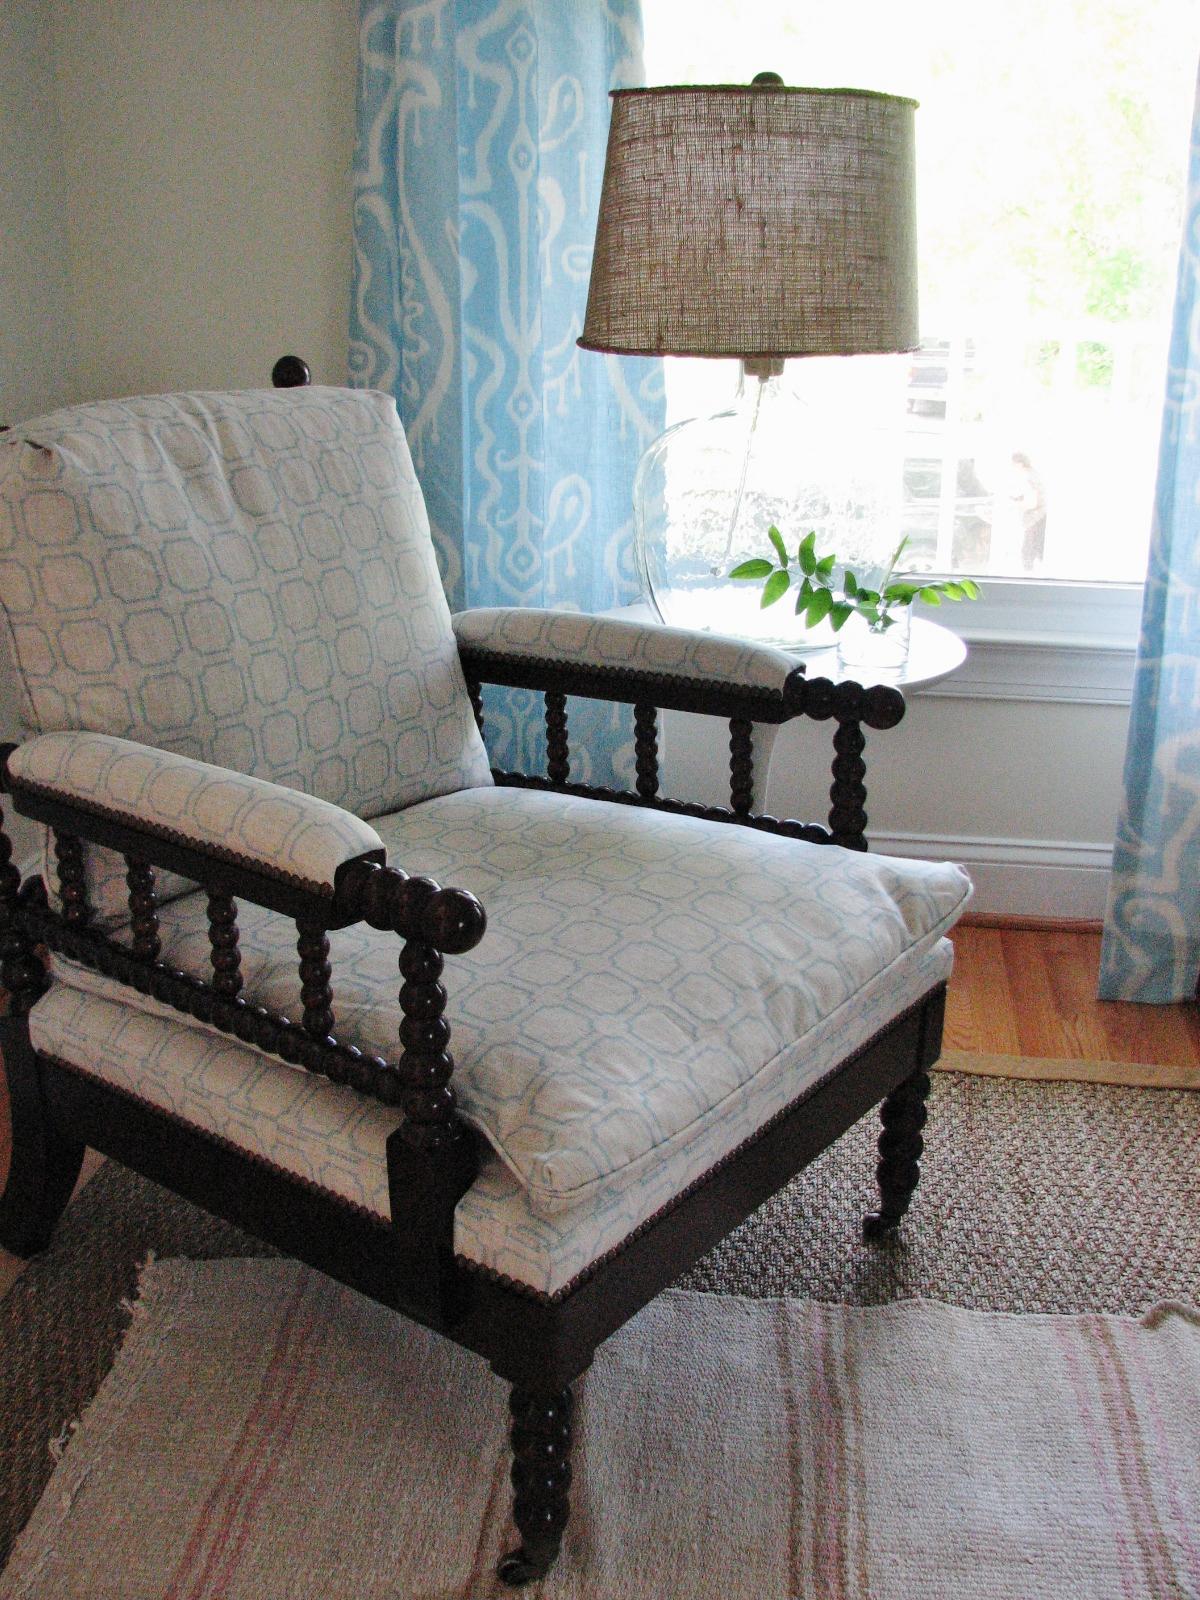 Spool Chairs Unique and Antique Furniture